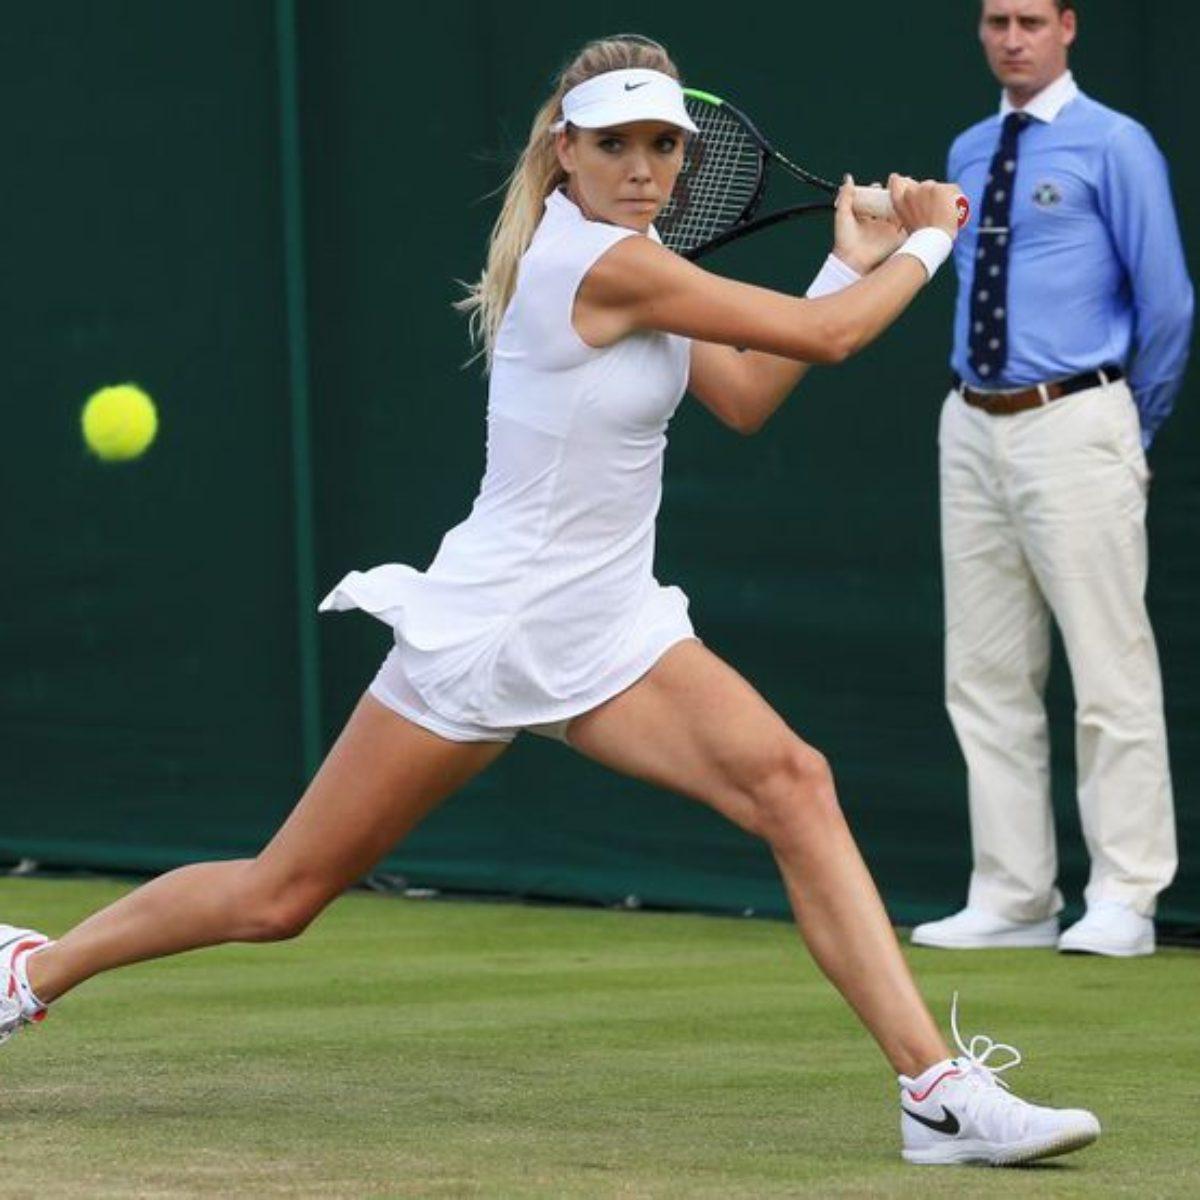 dieta di un tennista professionista